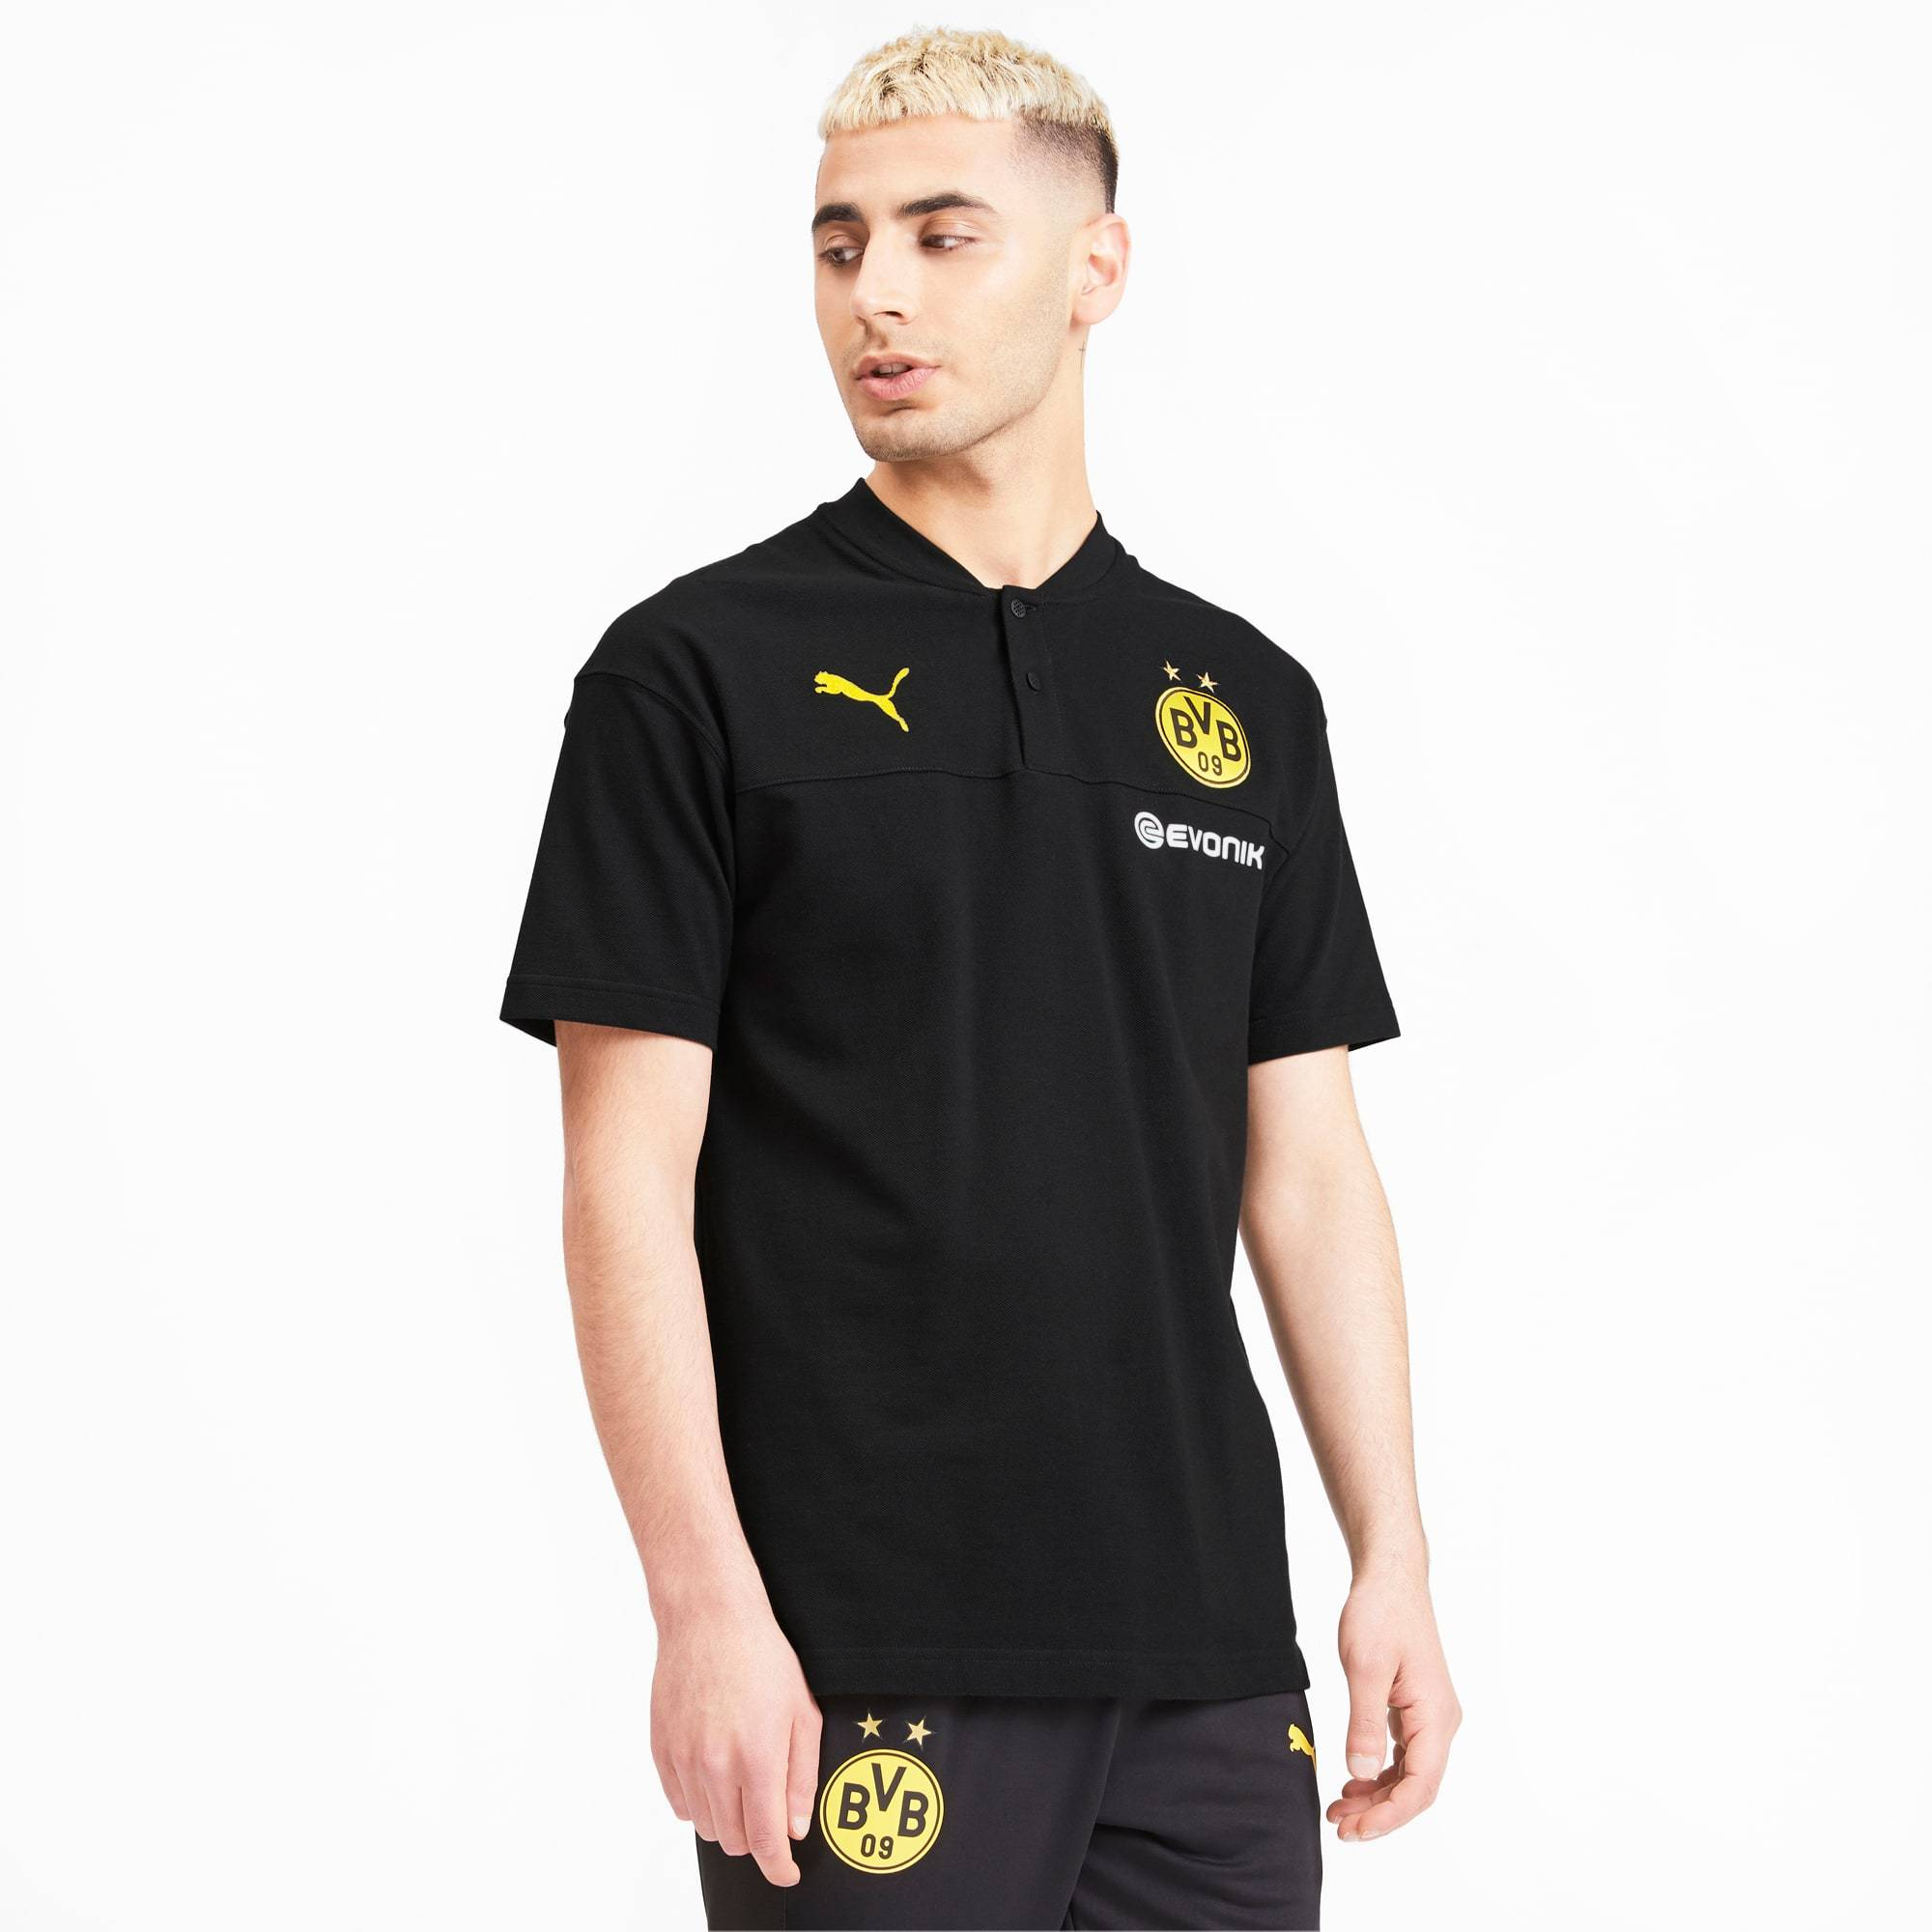 Puma BVB Casuals Men's Polo Shirt,  Black/Phantom Black, size Small, Clothing